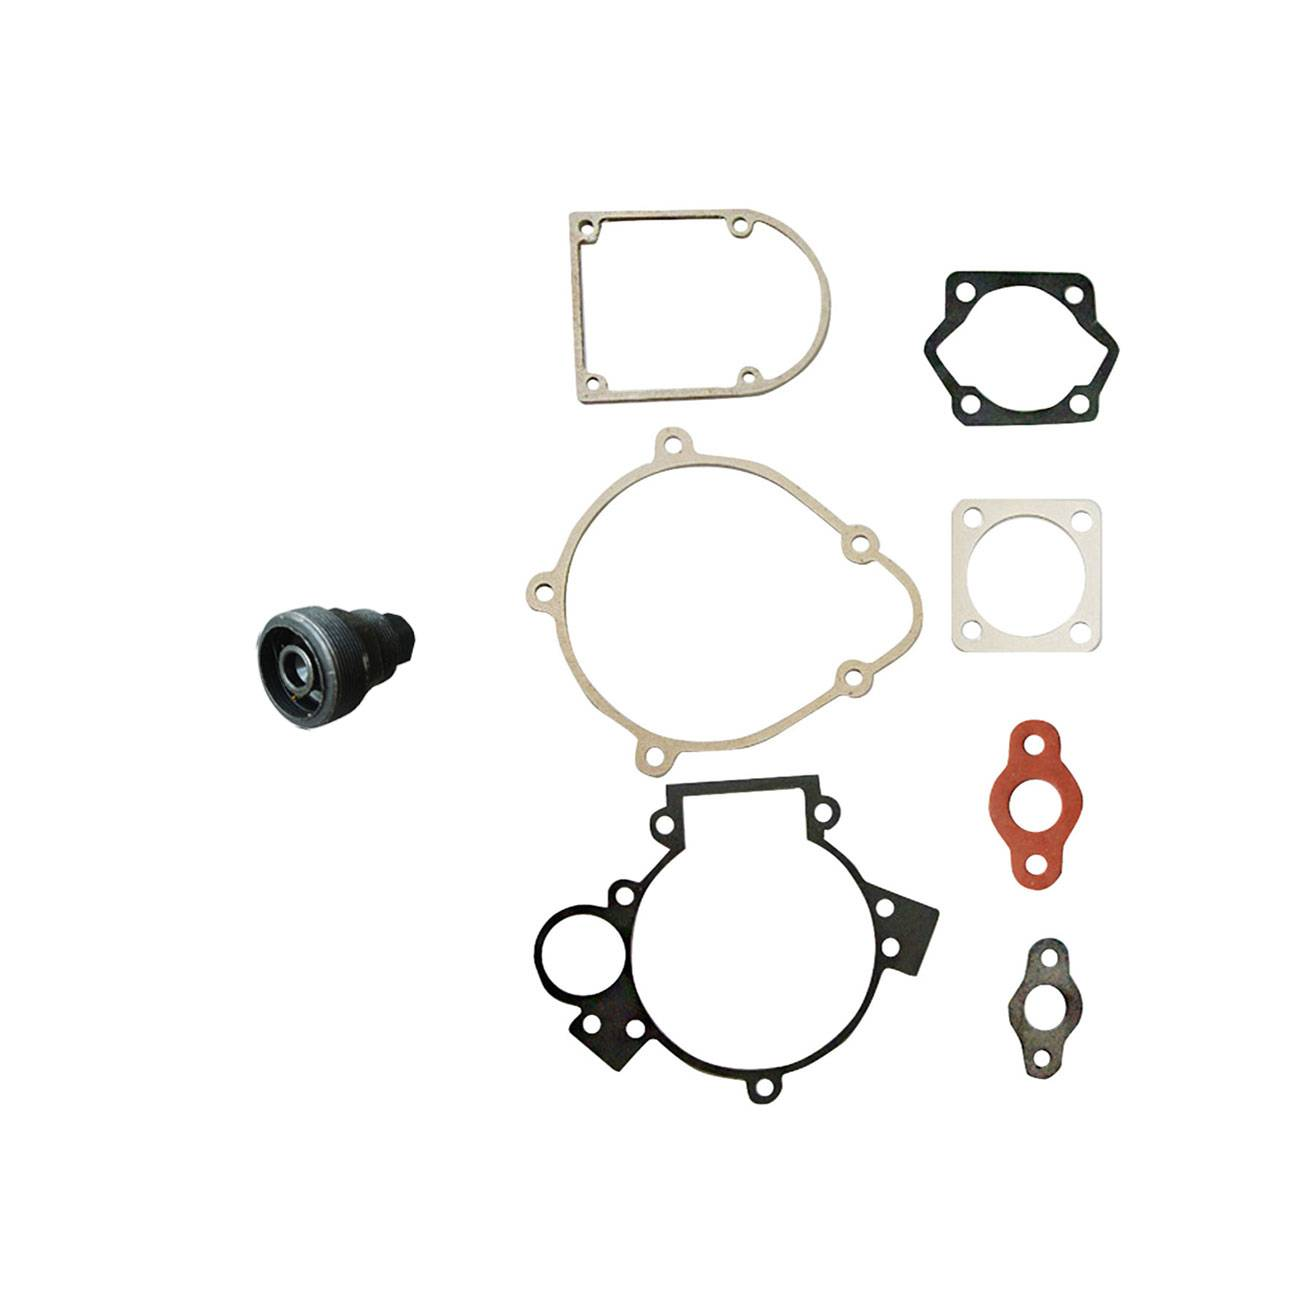 Clutch Gear Puller Amp Gasket For 66 80cc 2 Stroke Engine